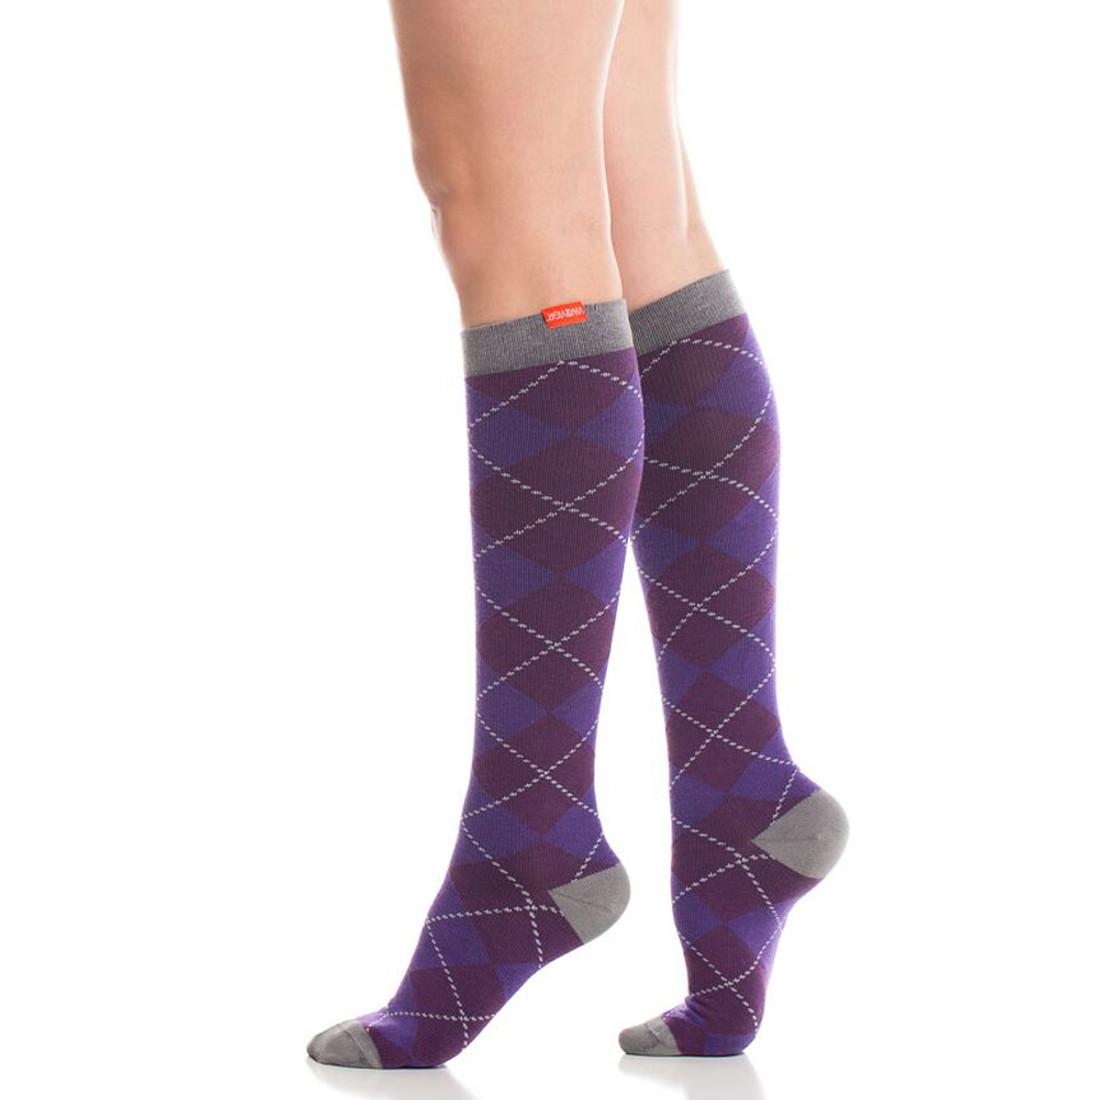 327f418b94 Women's Cotton Knee High Compression Socks Purple Argyle - Purple ...